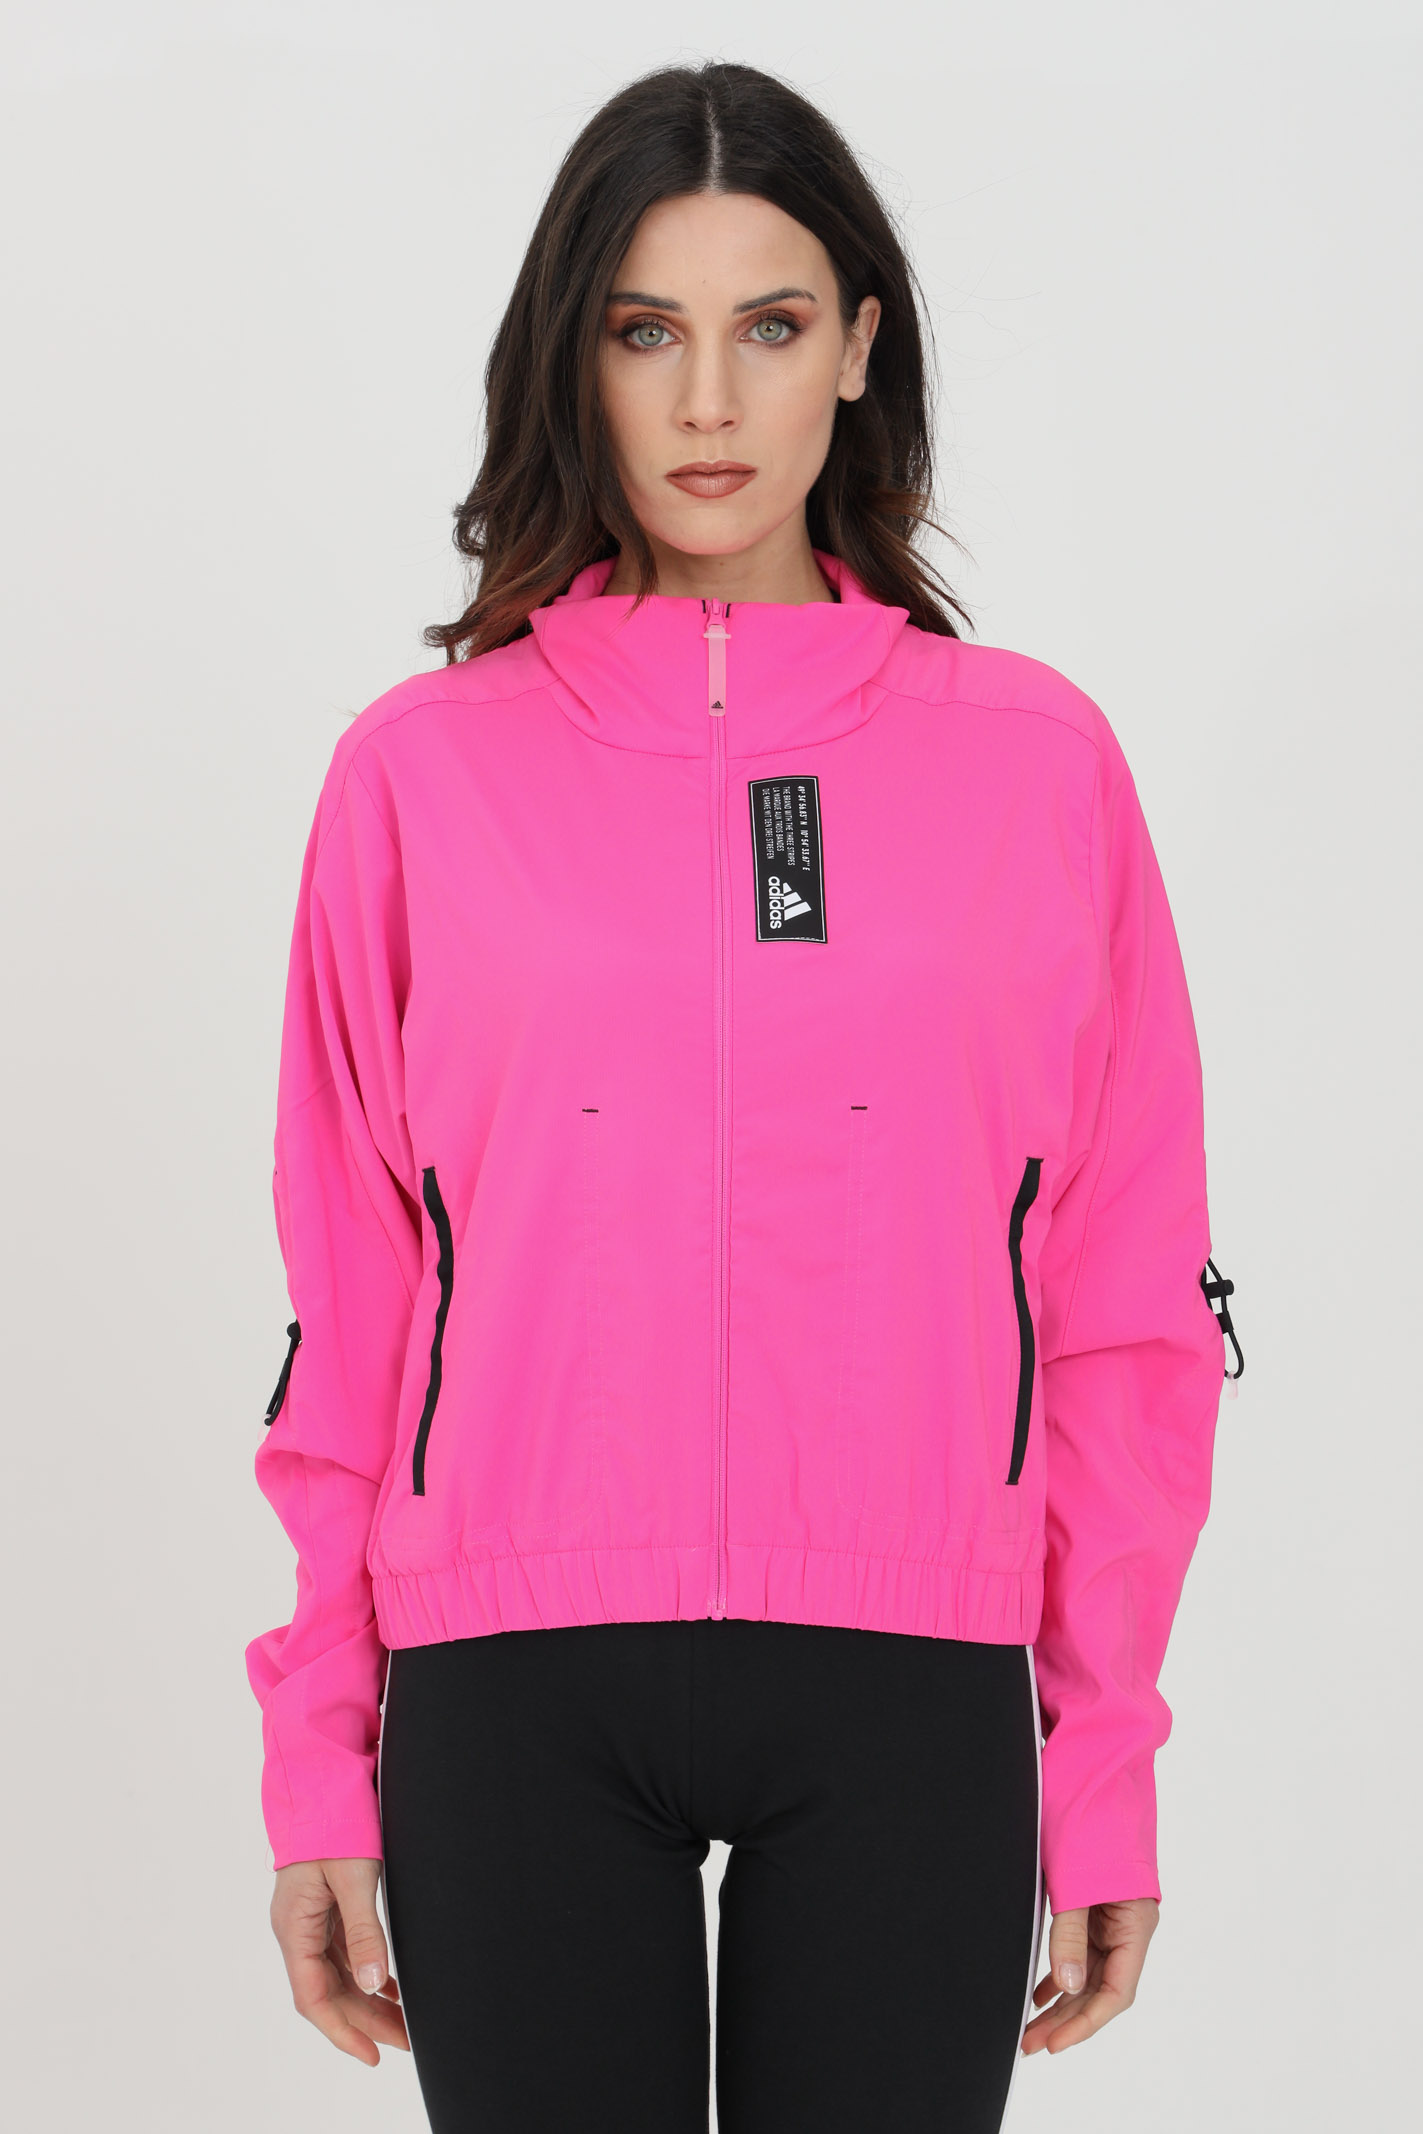 Giacca sportswear primeblue ADIDAS   Giubbotti   GL9531.